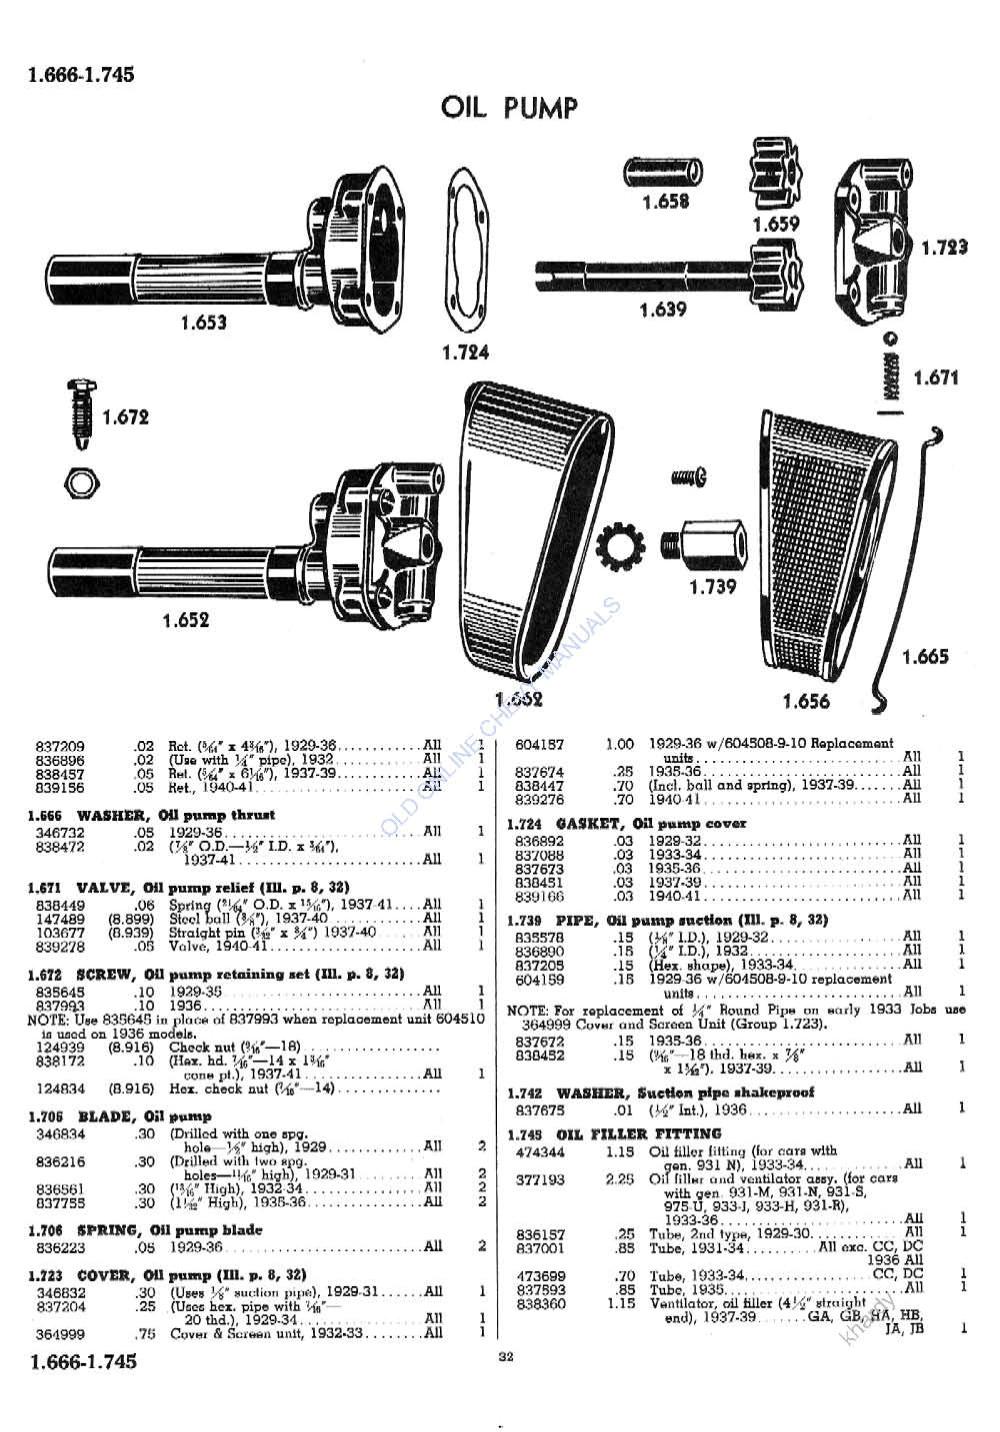 1931 Chevrolet Wiring Diagram - Free Download Wiring Diagram